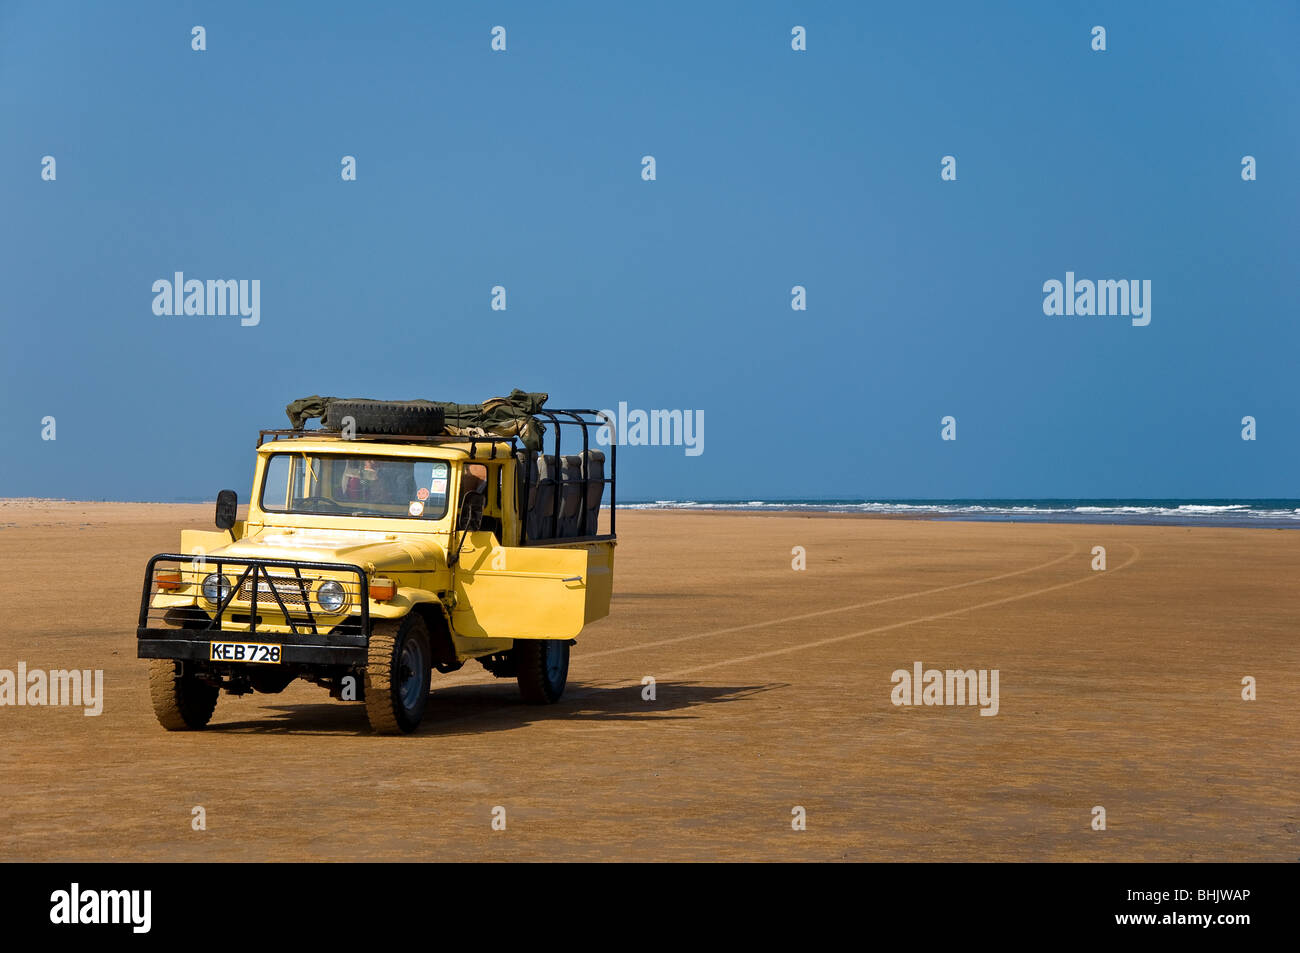 Jeep on a deserted beach, Malindi, Kenya, Africa - Stock Image